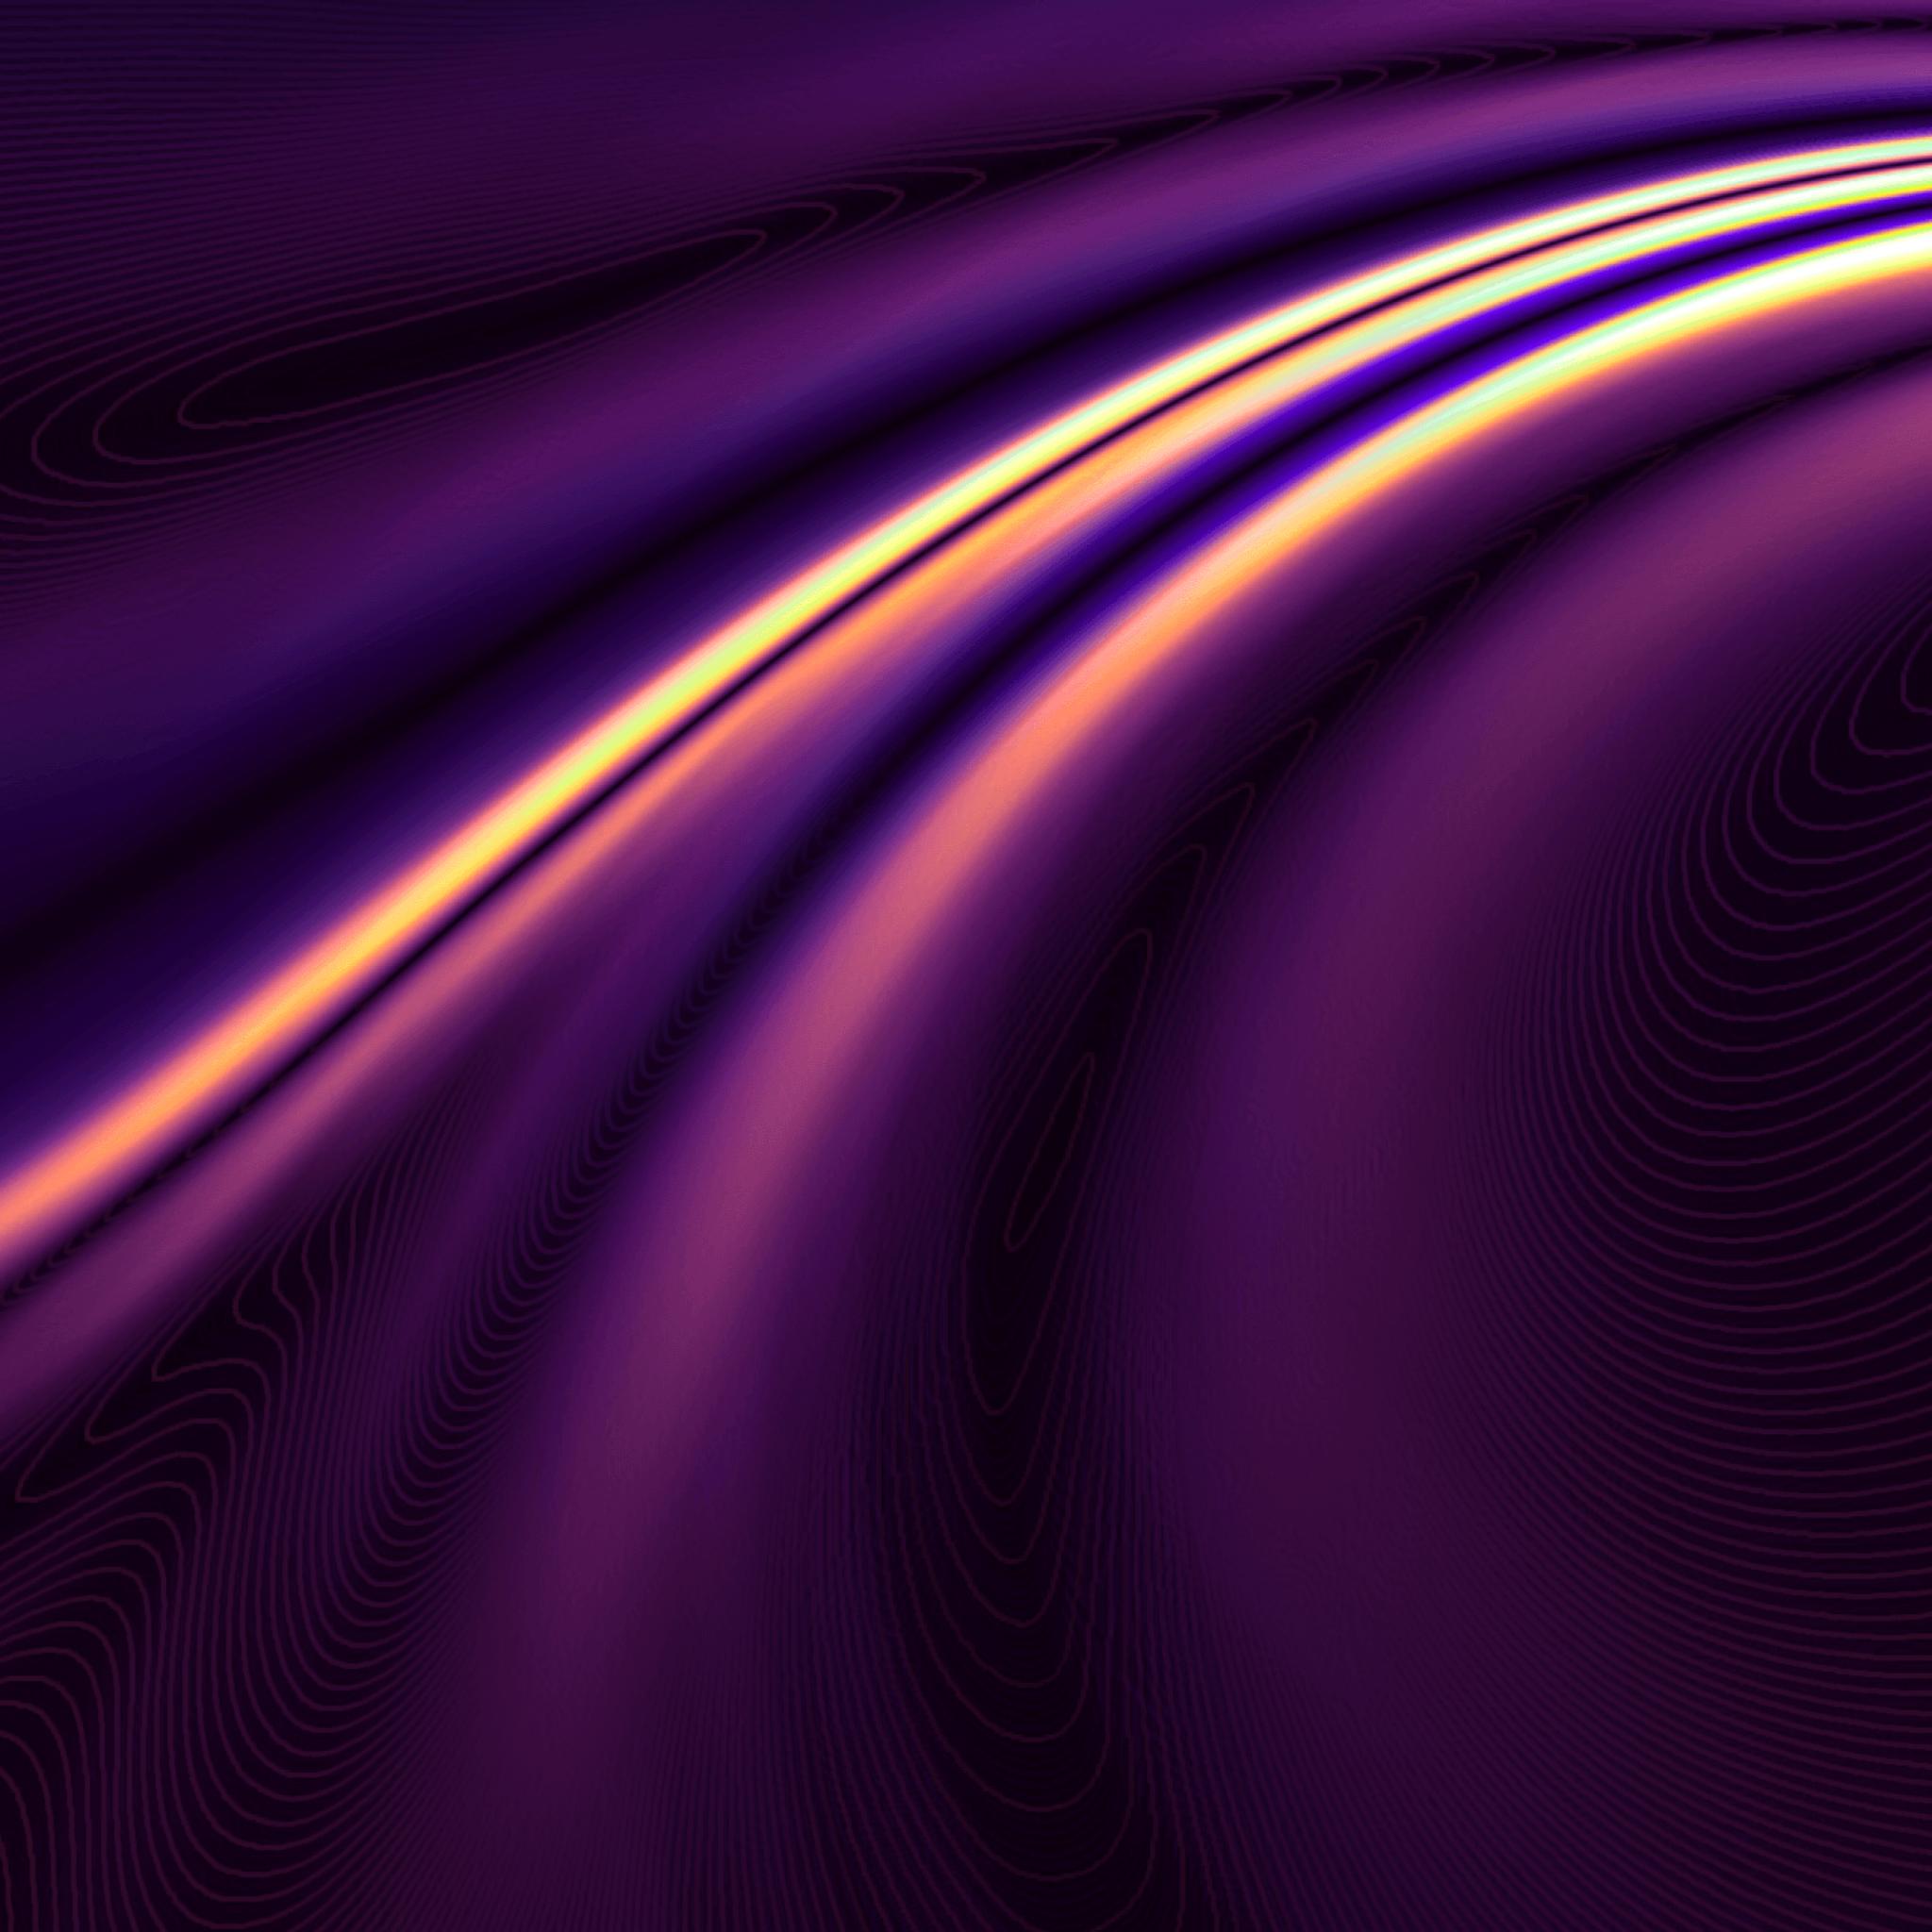 OnePlus 8 Pro 4K Wallpaper, Stock, Purple, QHD, 2020